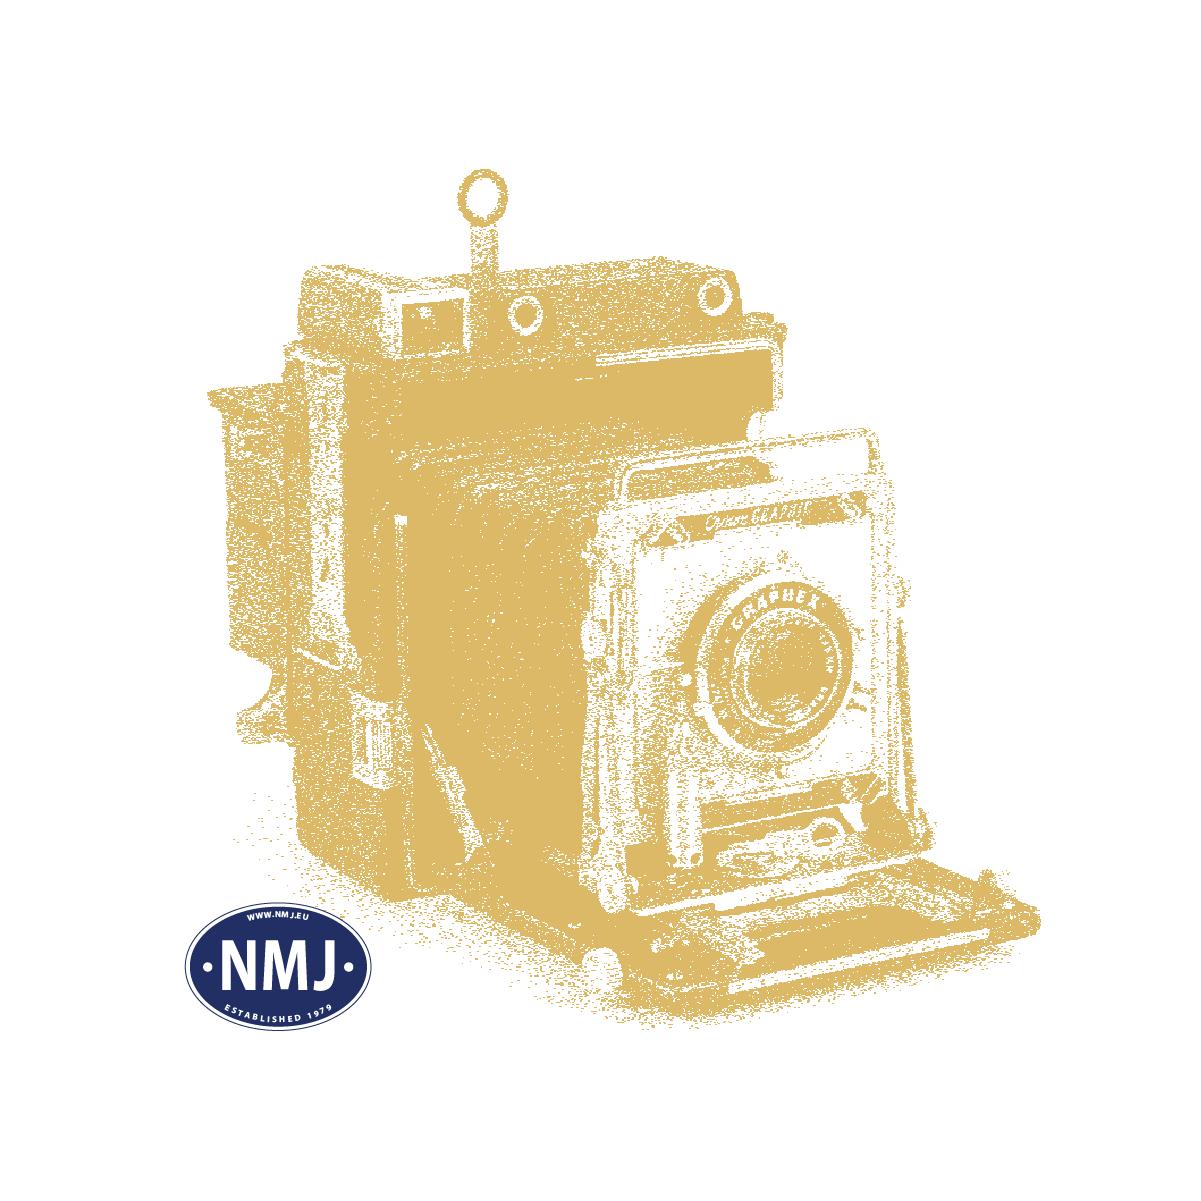 "NMJT605.305 - NMJ Topline SJ Ibblps-t 820 0 291-6 ""Nyckelkund"" kjølevogn"